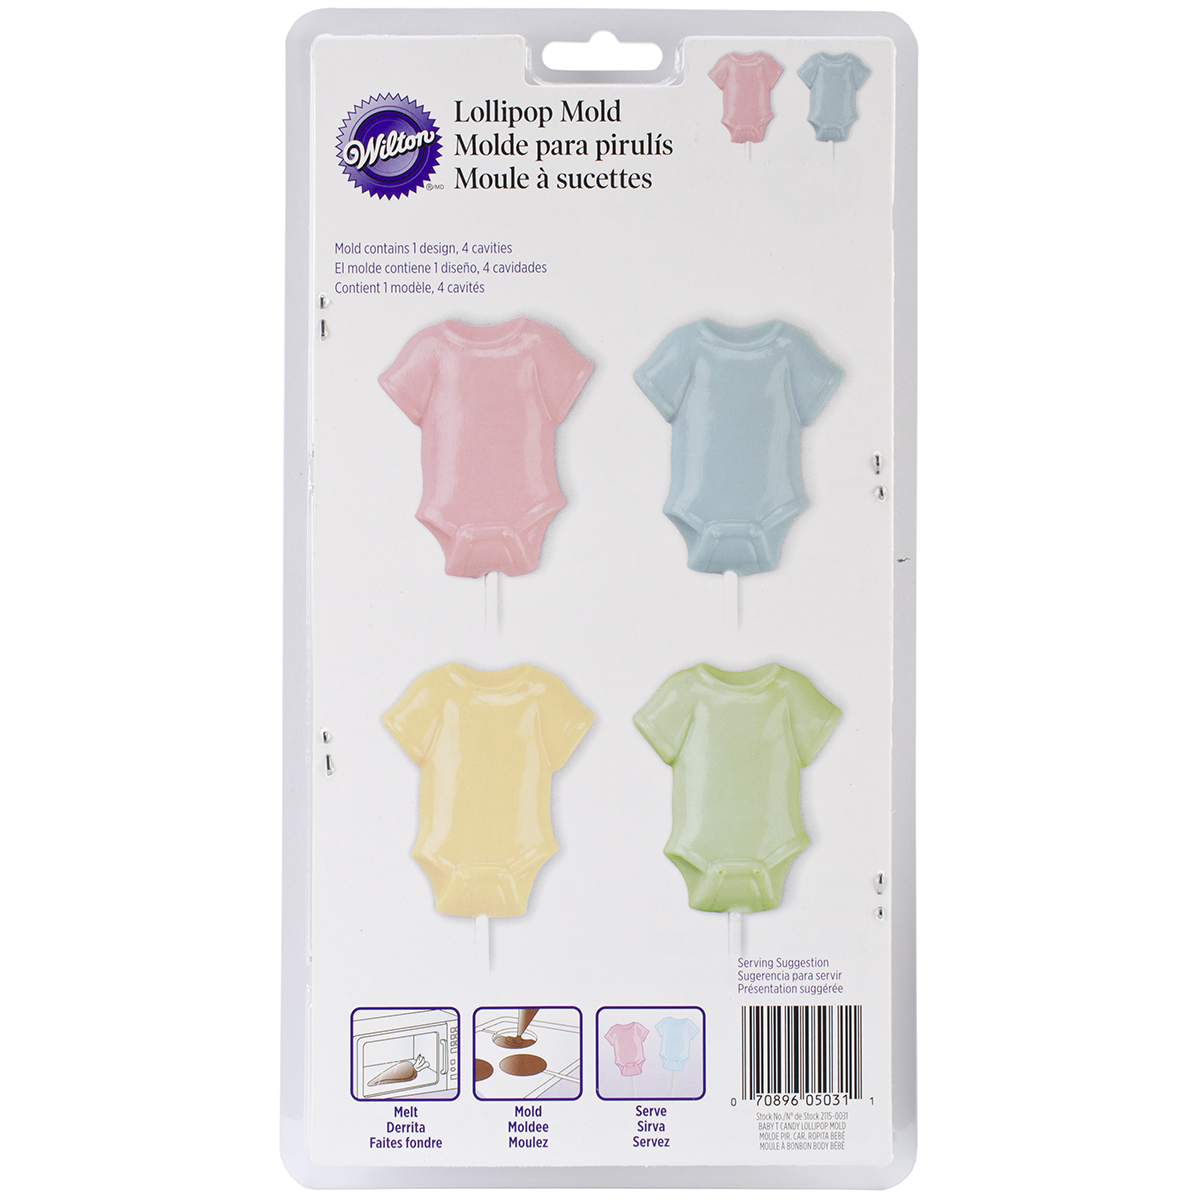 Wilton 4-Cavity Lollipop Mold Baby Tee